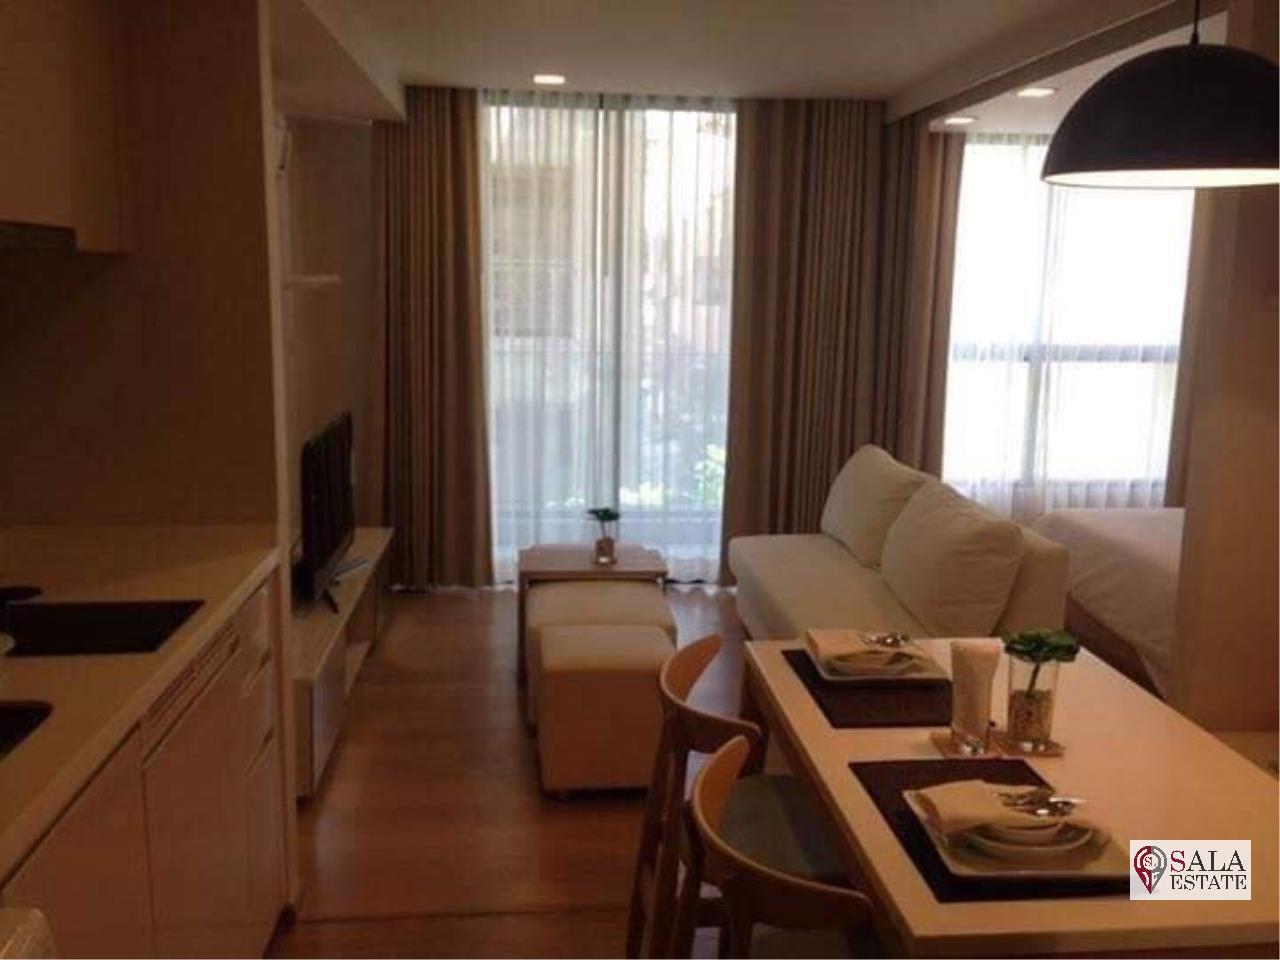 SALA ESTATE Agency's (FOR RENT) LIV@49 – BTS PHROM PHONG, 1 BEDROOM 1 BATHROOM, FULLY FURNISHED, CITY VIEW 2